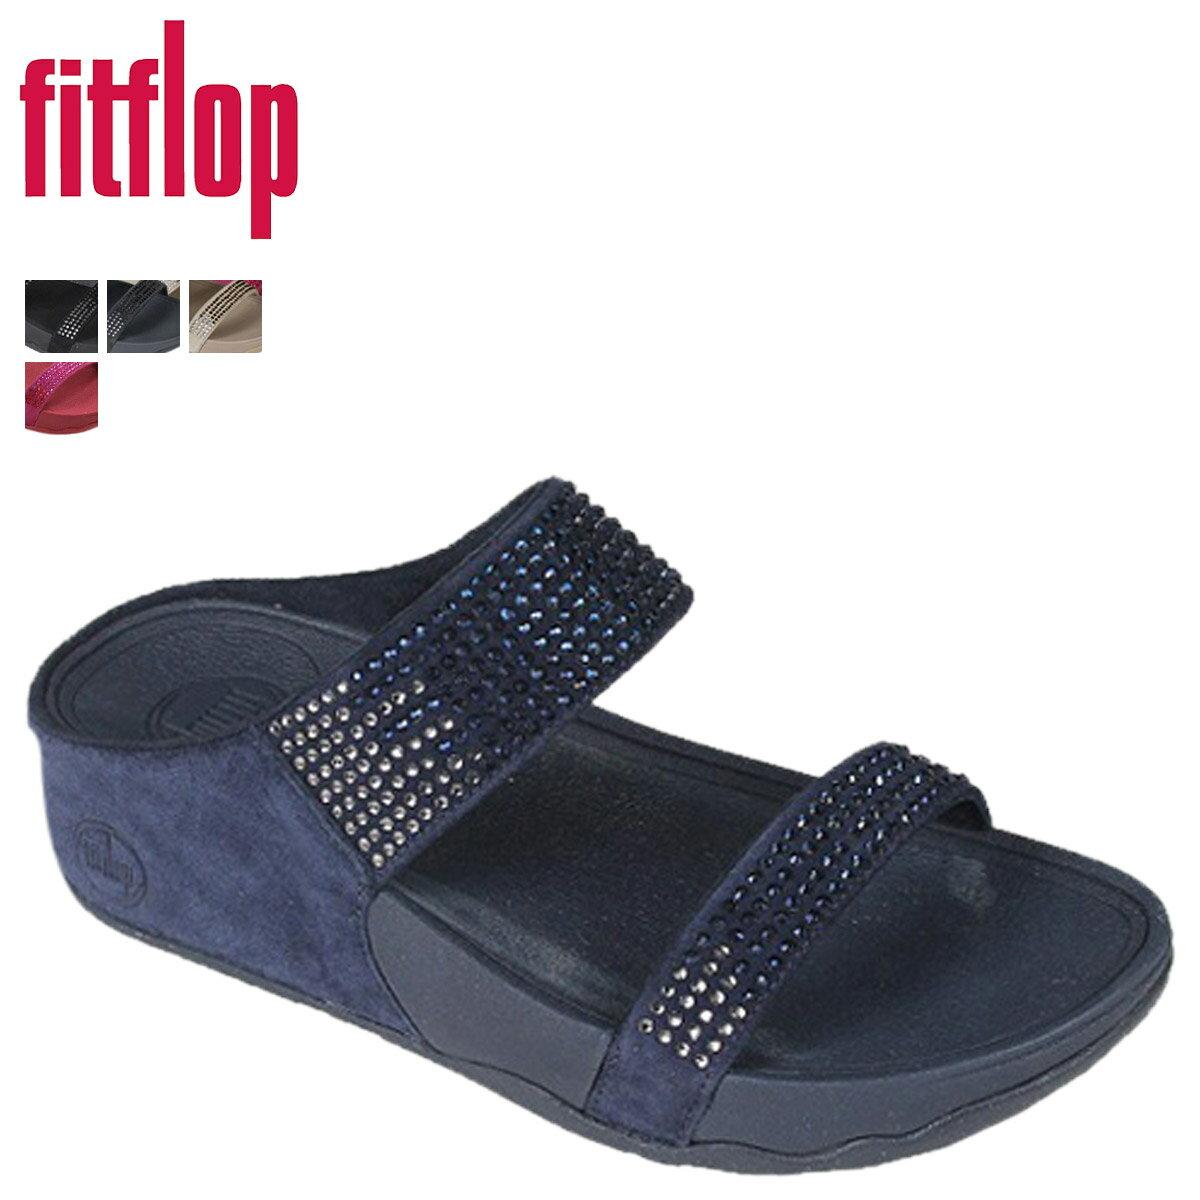 8d63a5ea1e06d3 Fitflop Store In Riyadh